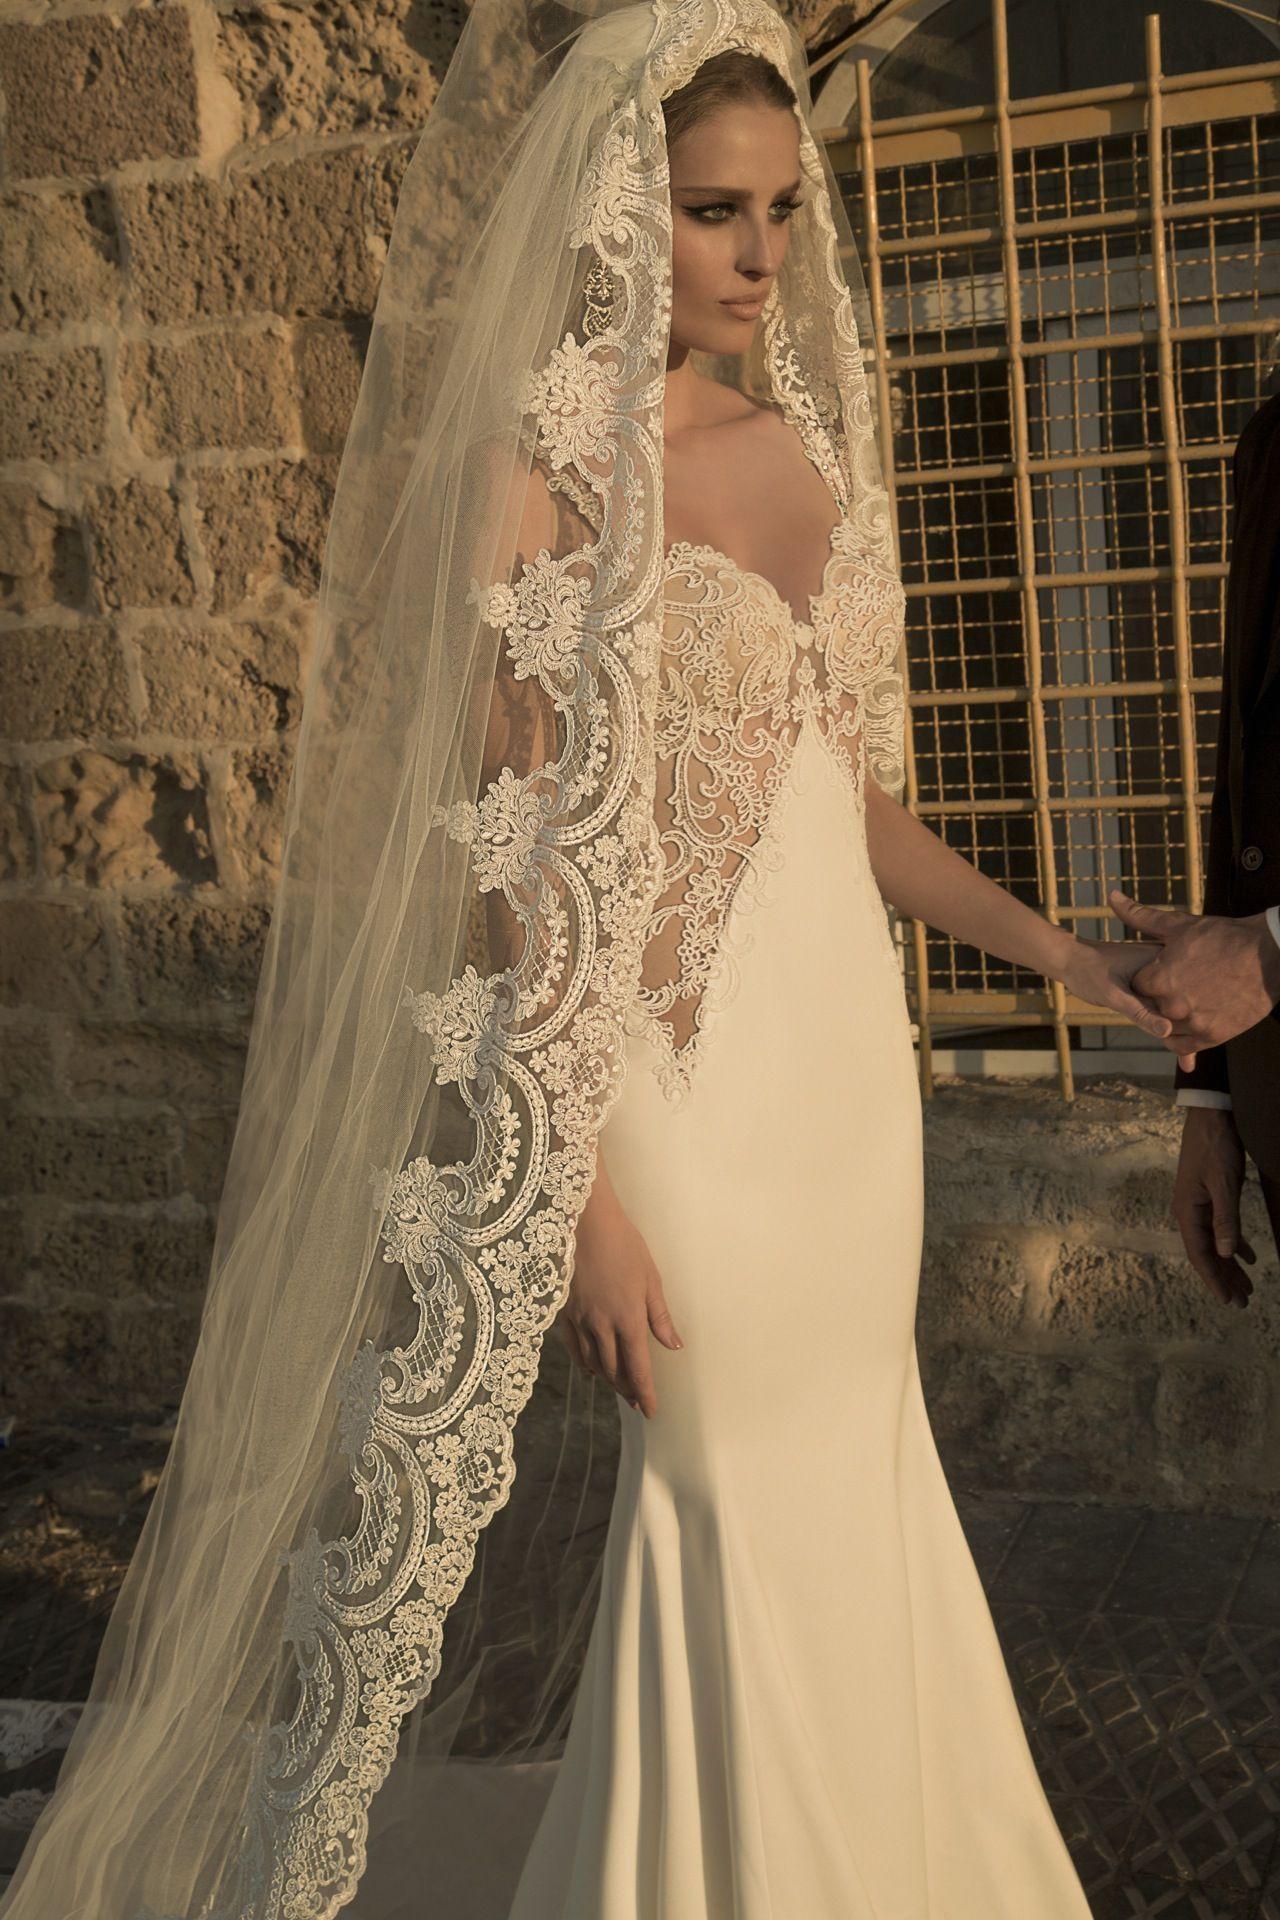 Fun Tight Wedding Dresses